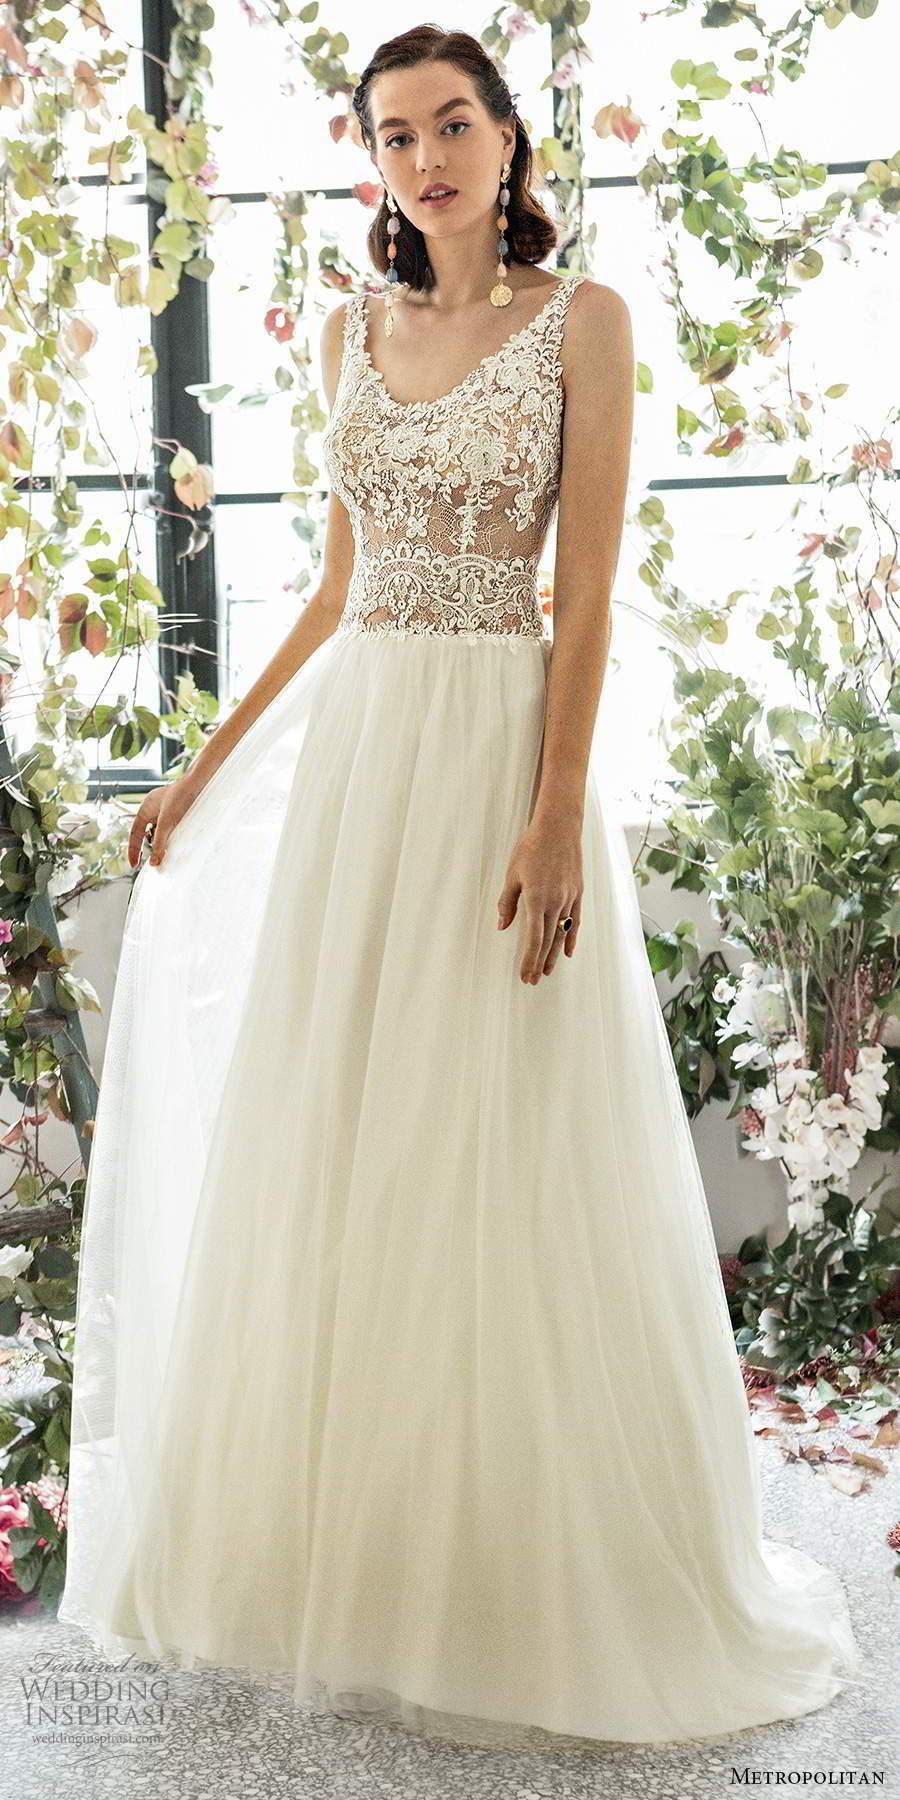 metropolitan spring 2020 bridal sleeveless lace straps embellished lace sheer bodice romantic a line wedding dress (6) scoop back chapel train mv